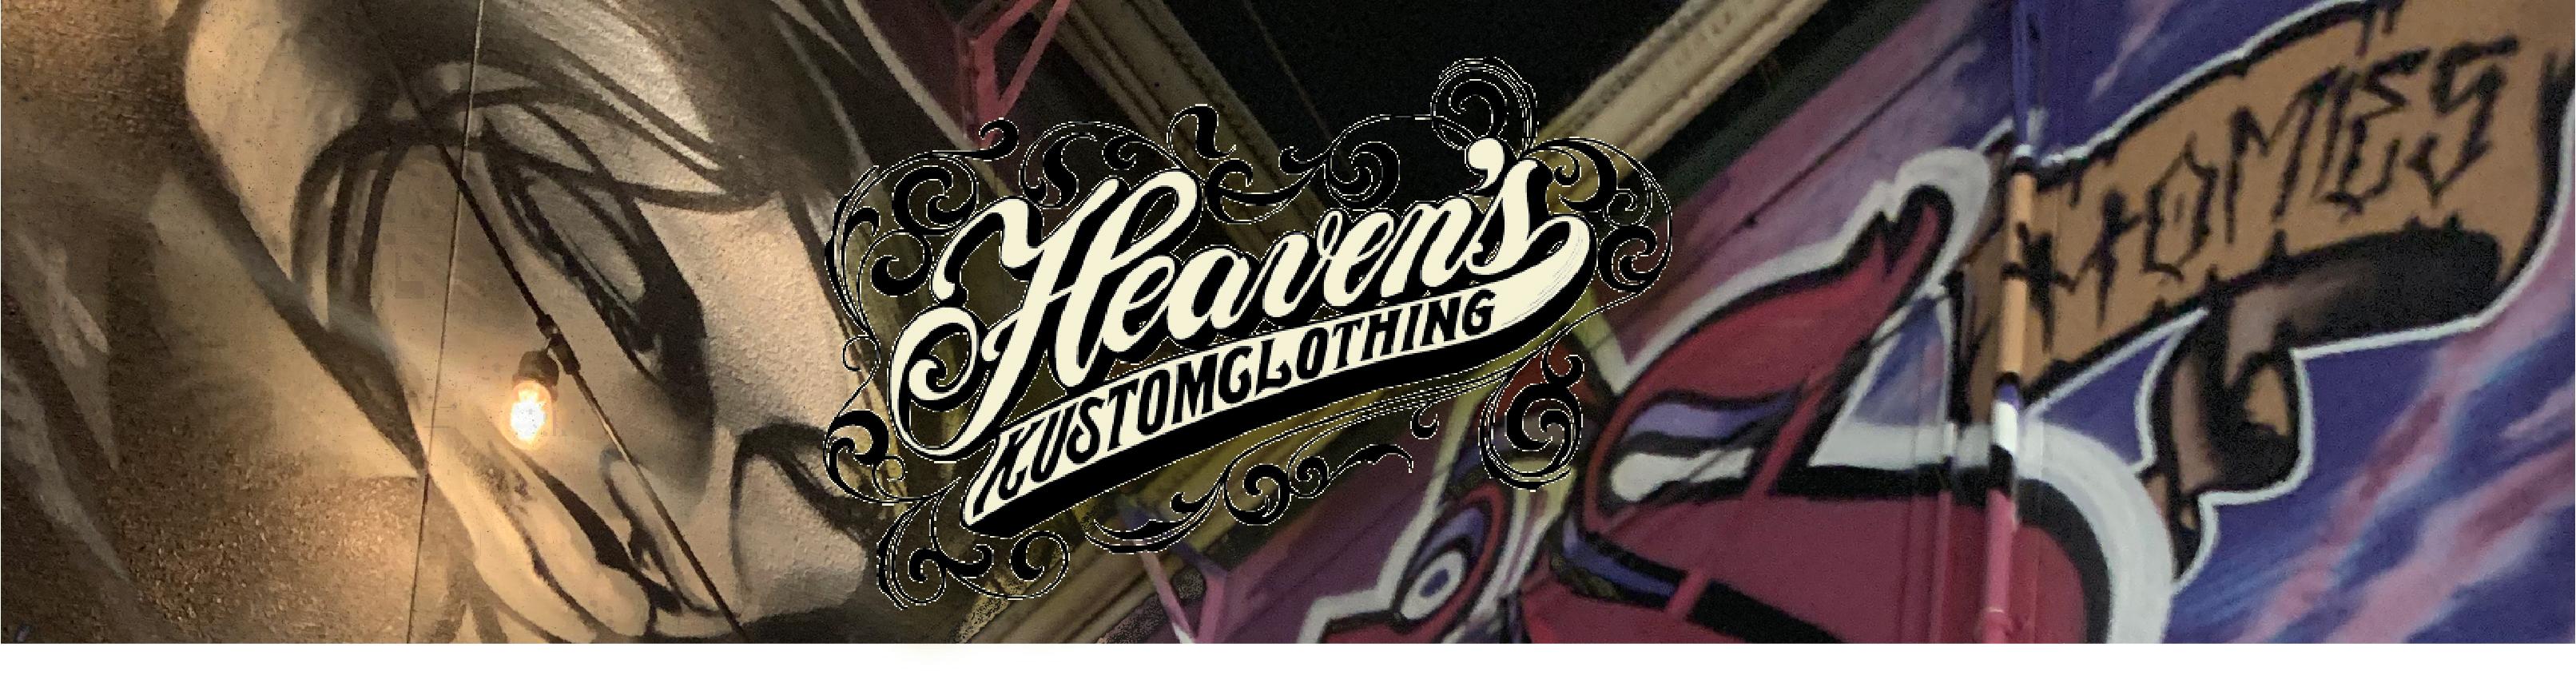 HEAVEN'S